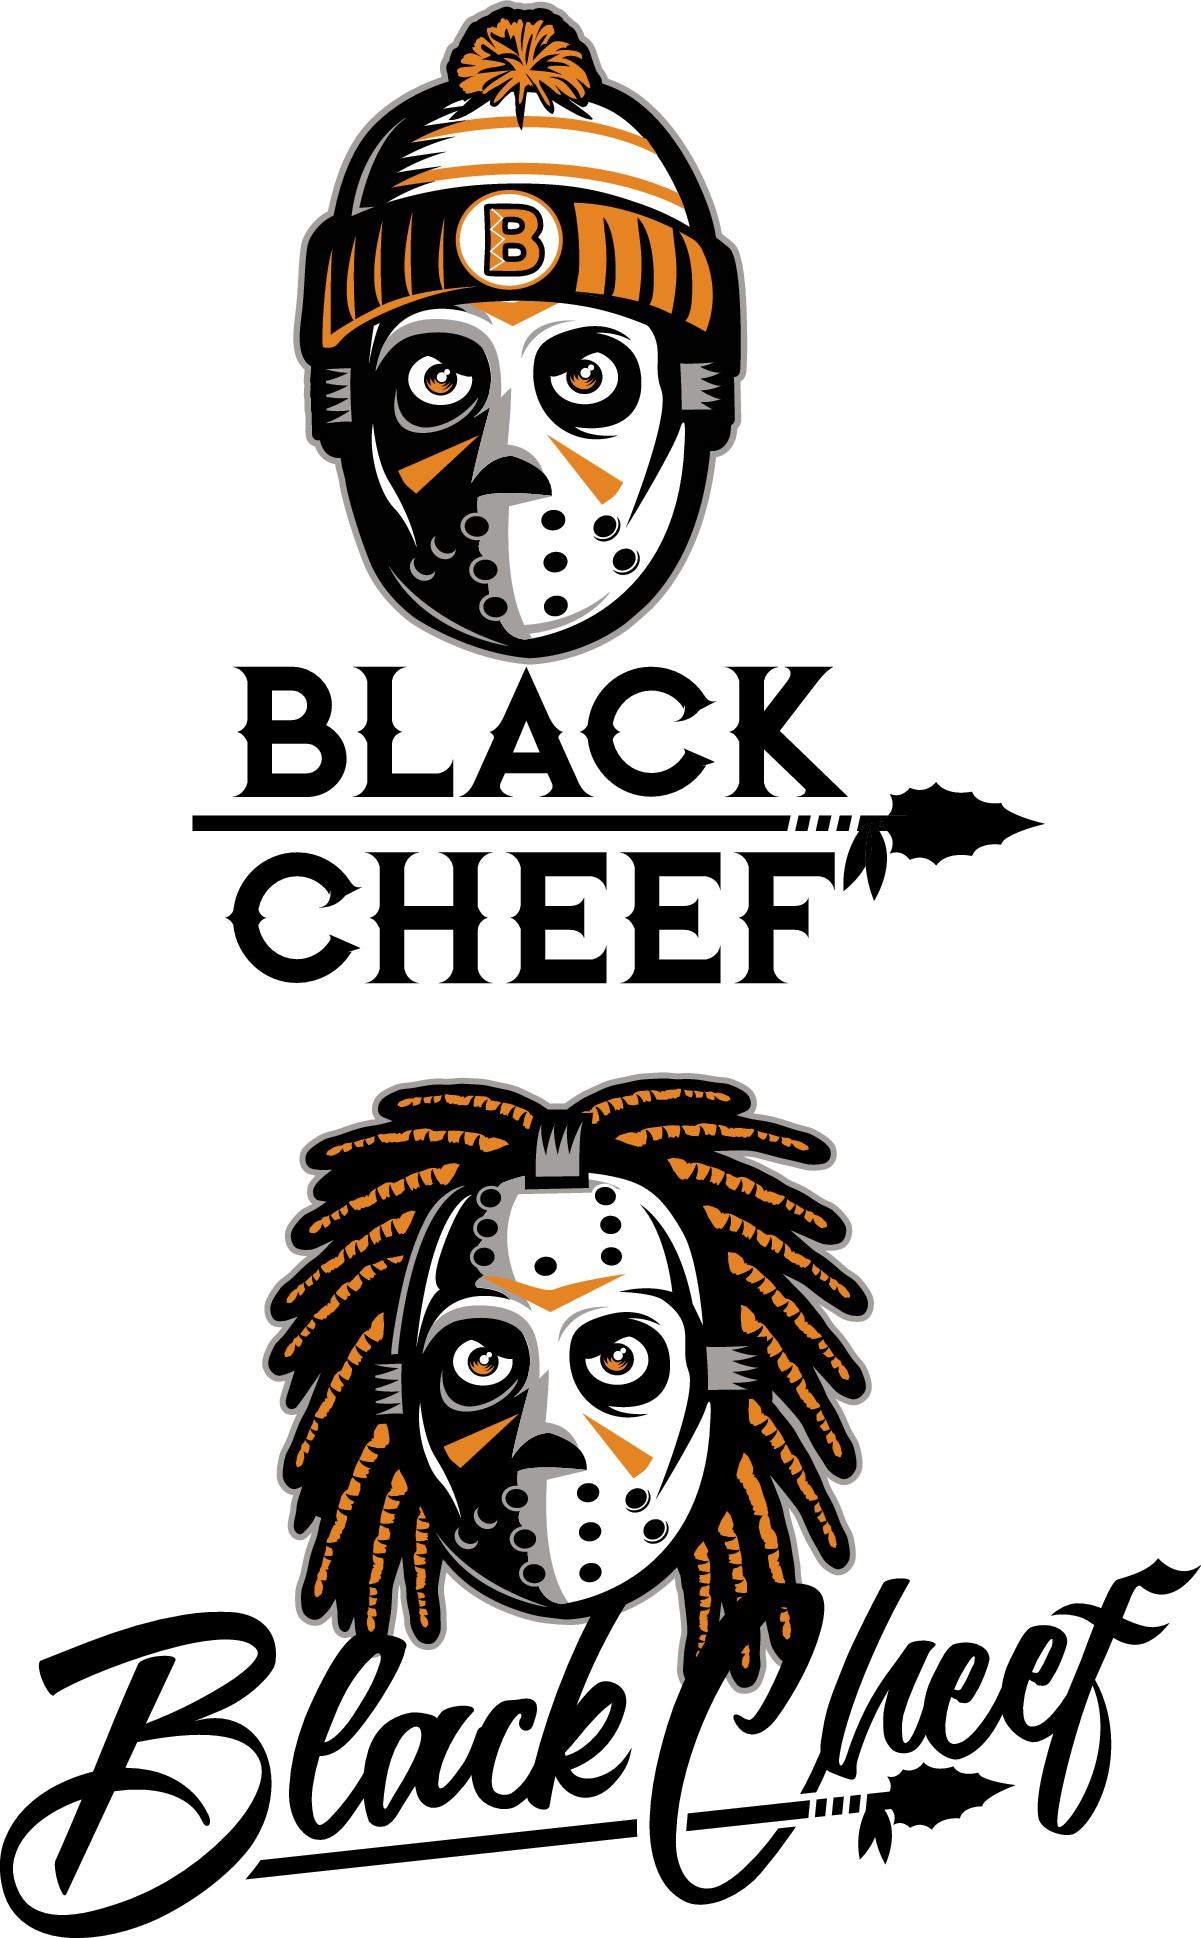 BLACK CHEEF